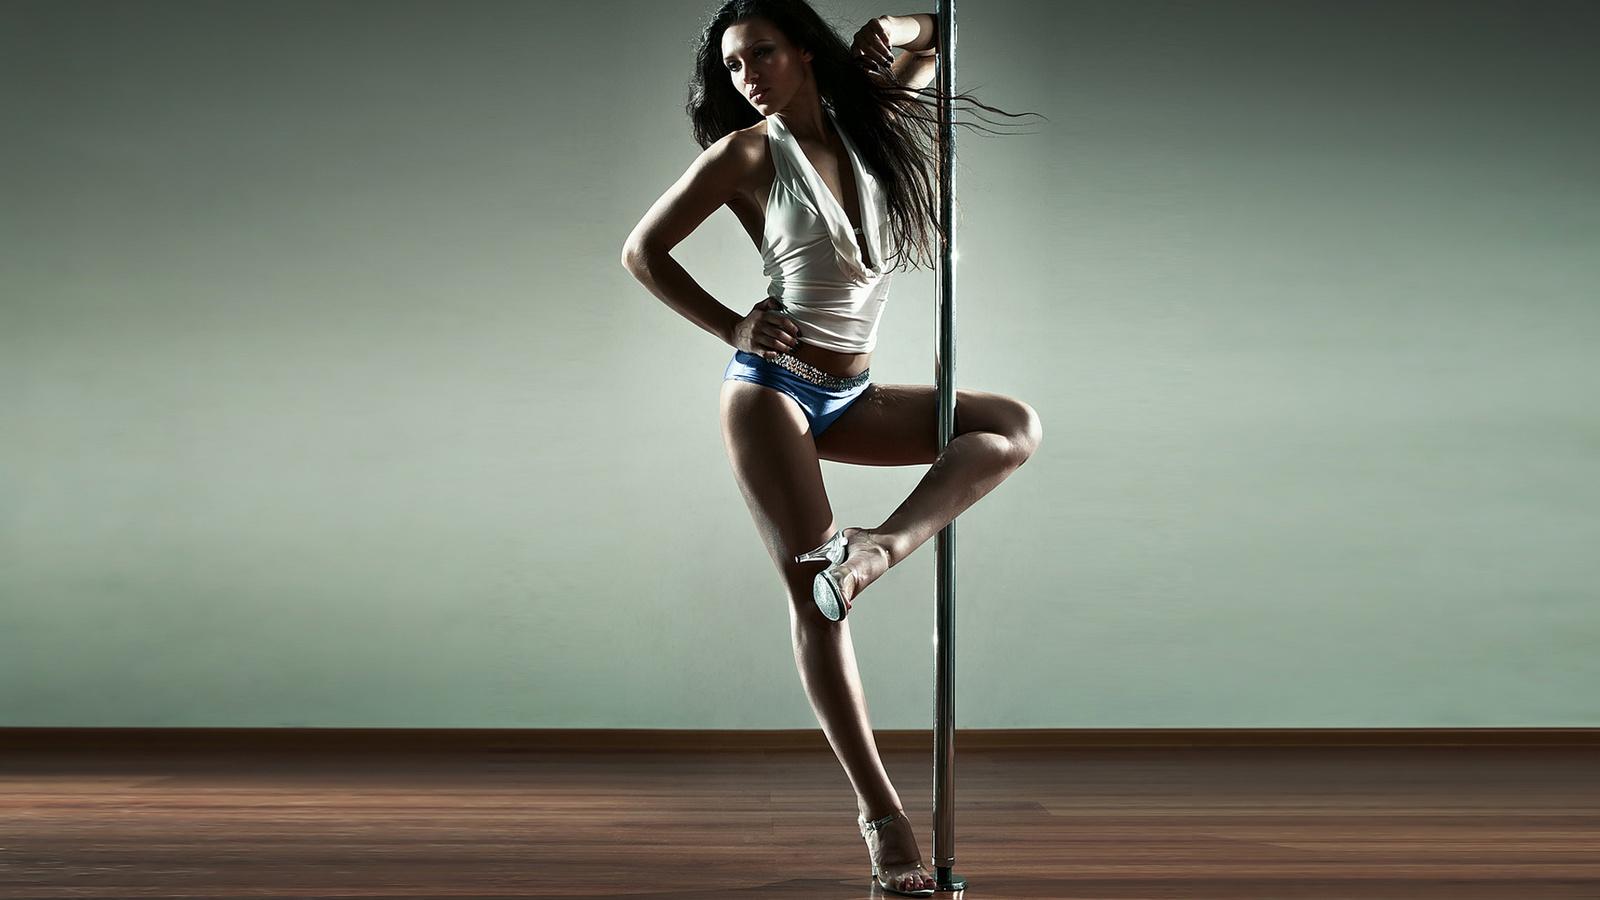 Фото девушка танцует стриптиз, Новые галереи про стриптиз. Голые девушки 24 фотография